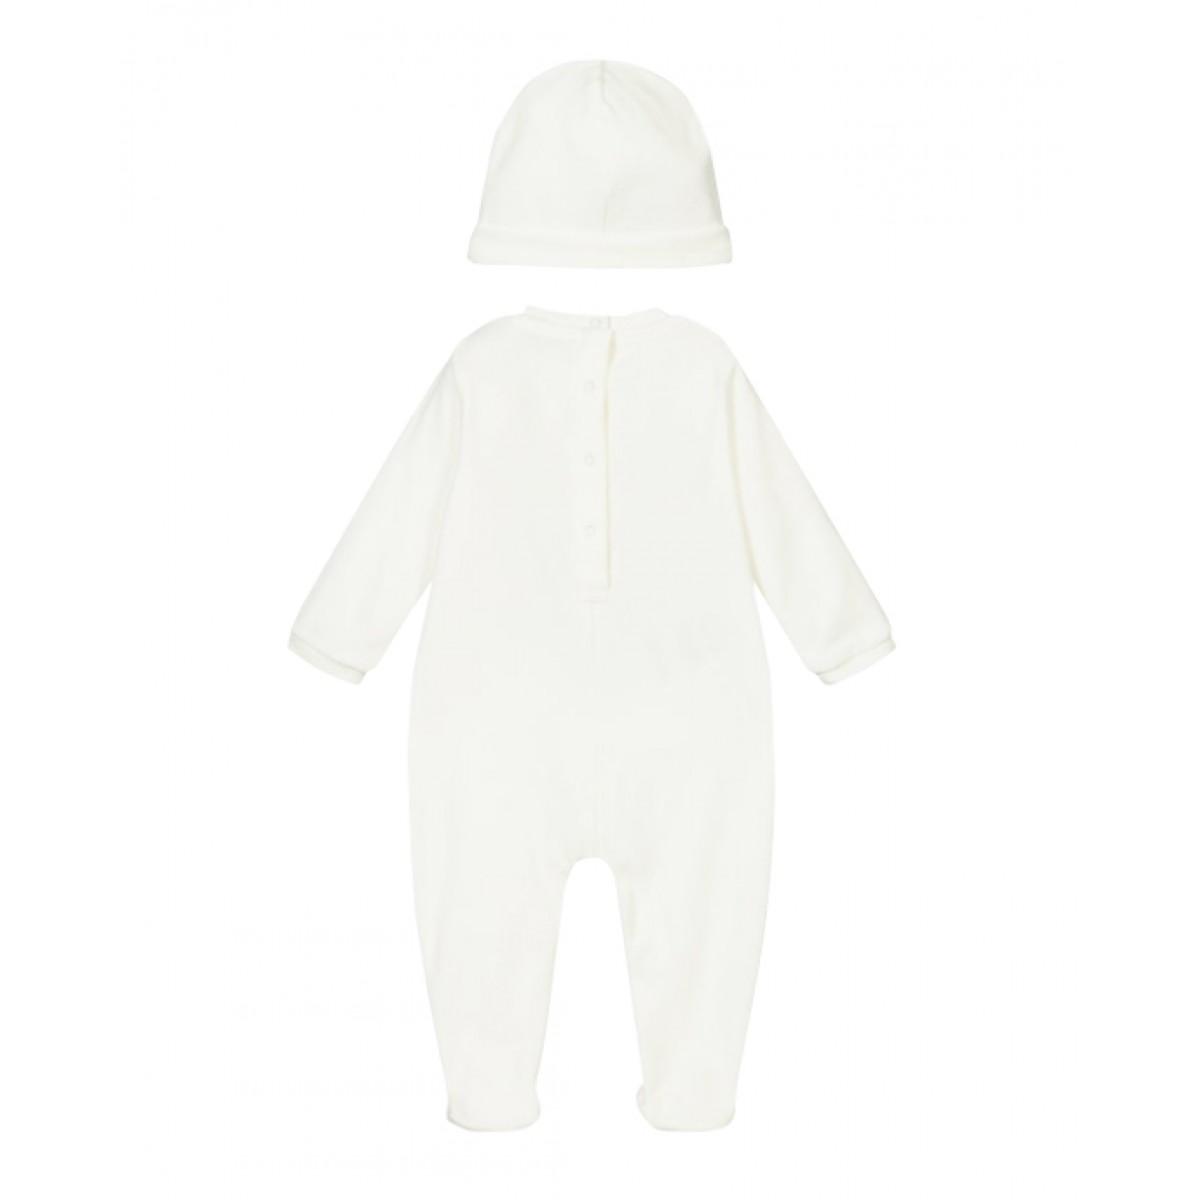 Babygrow overal & hat gift set